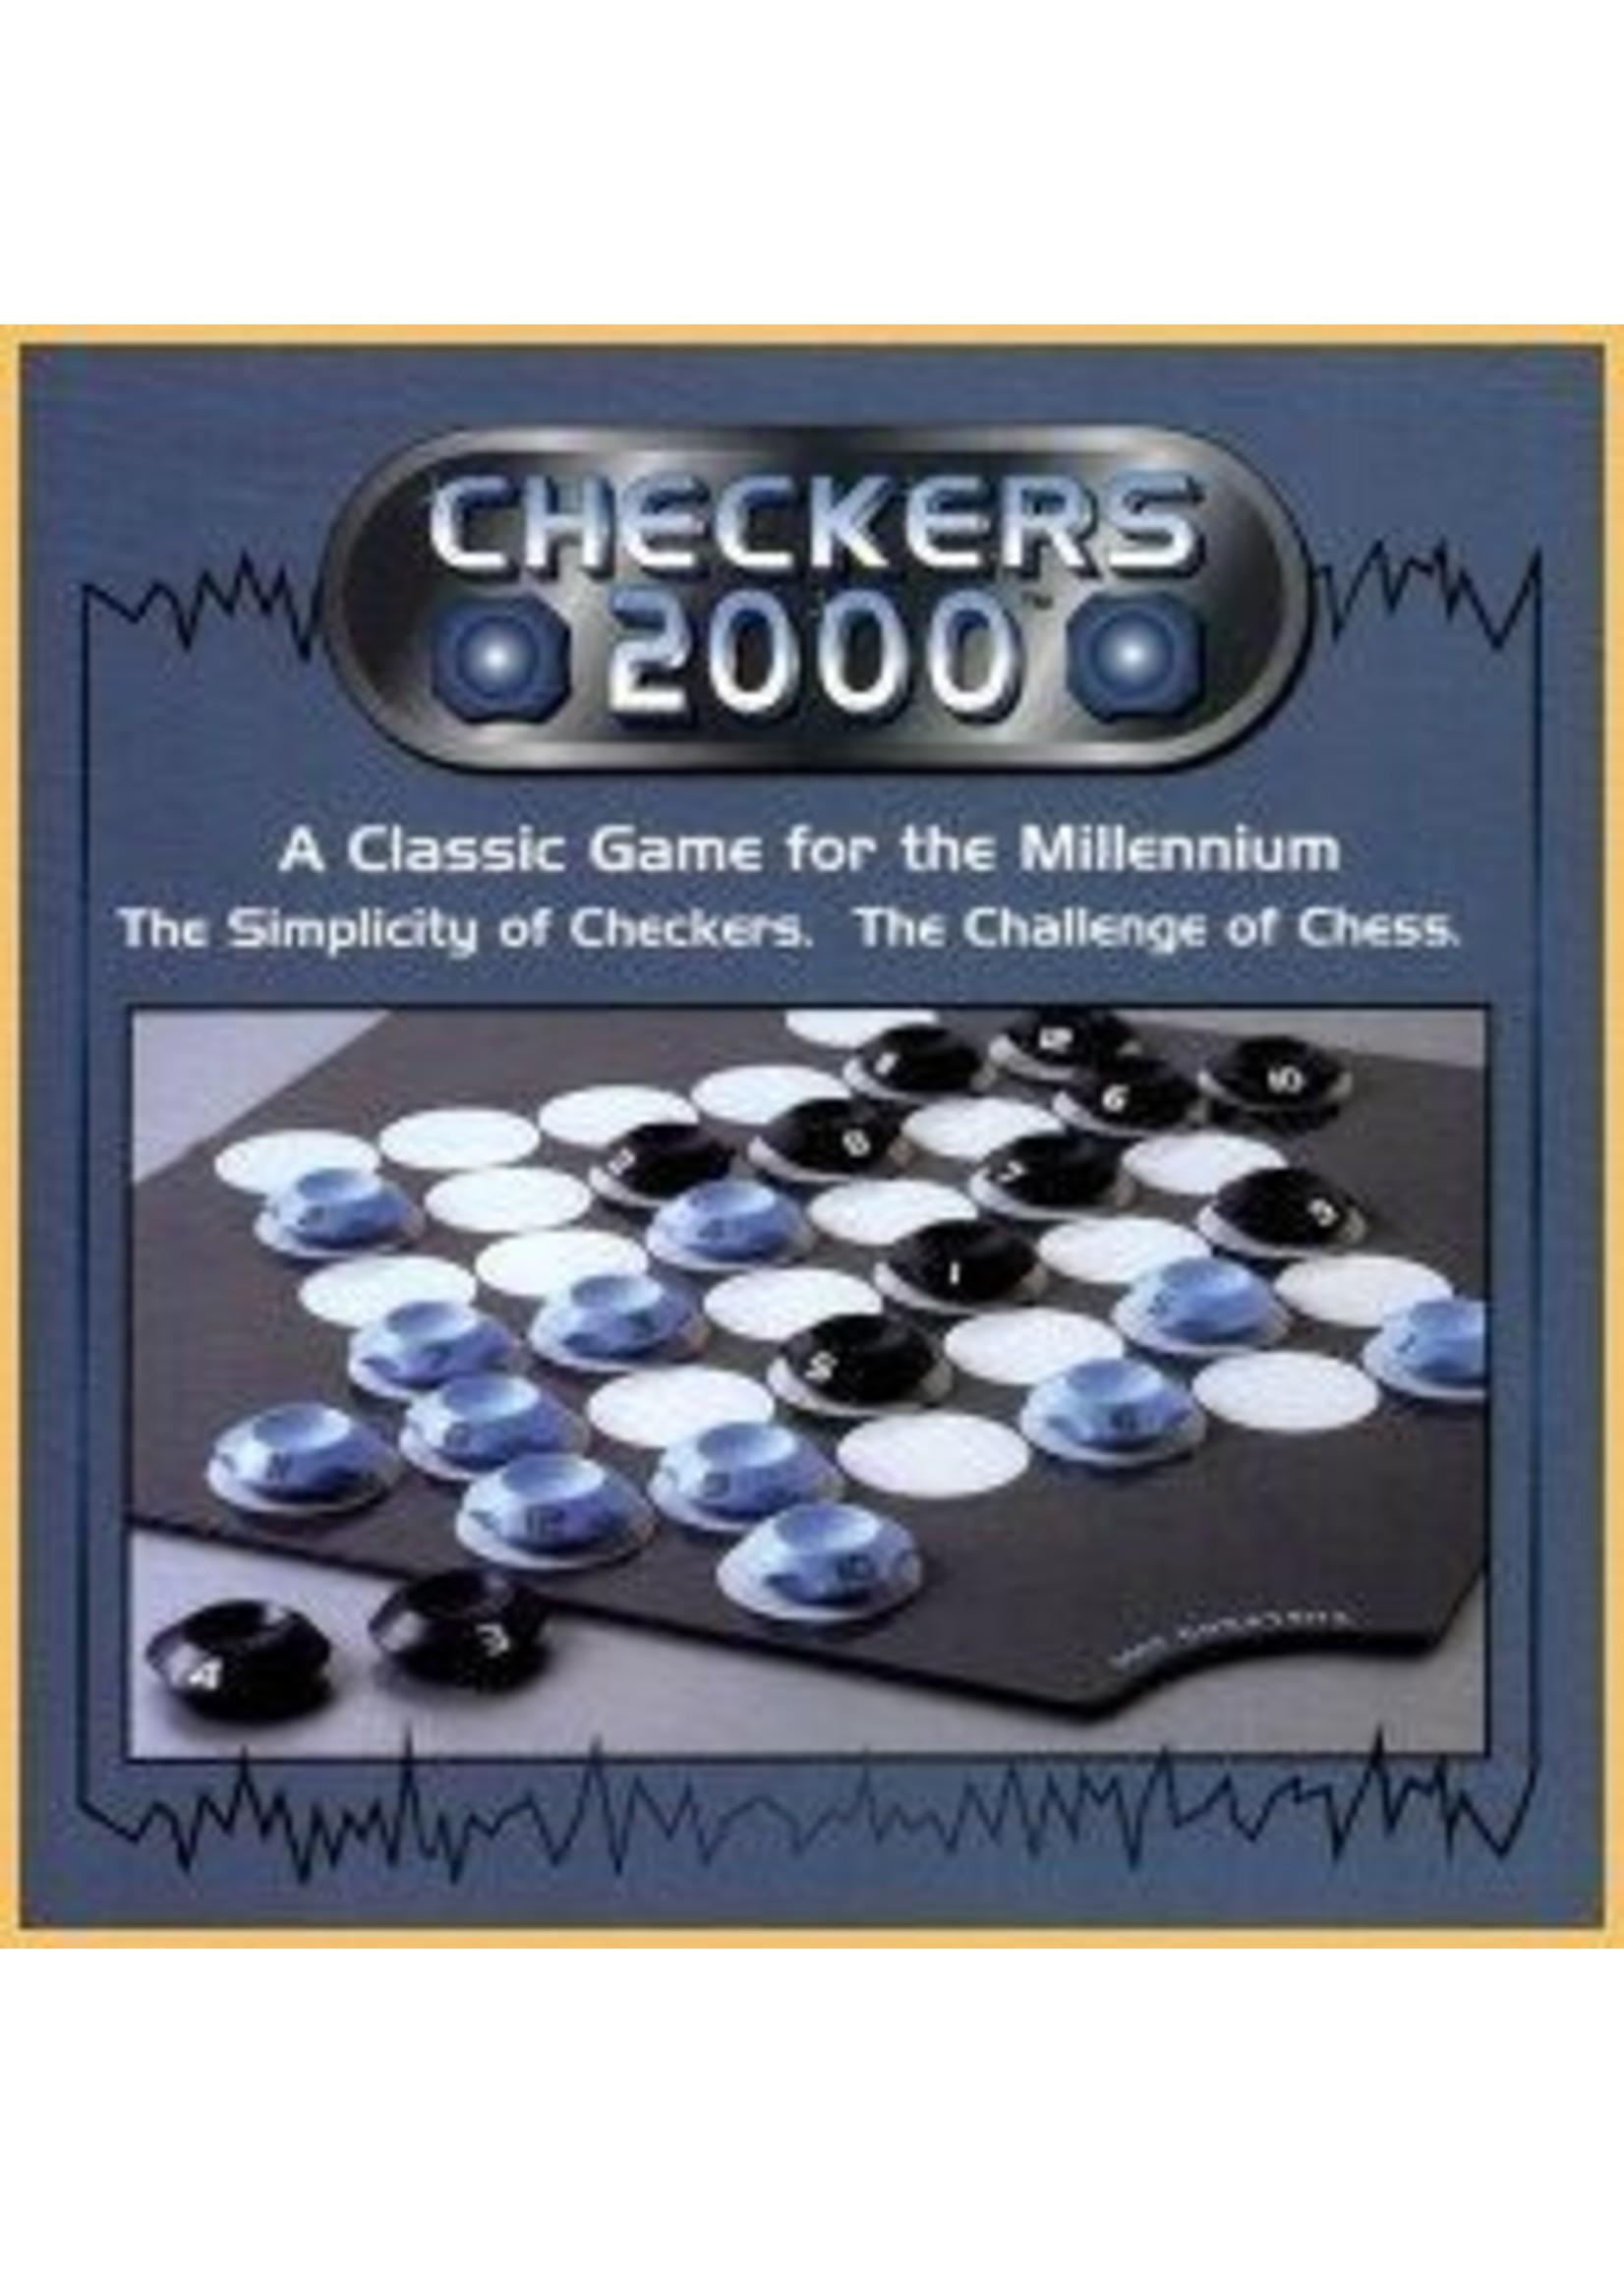 Checkers 2000